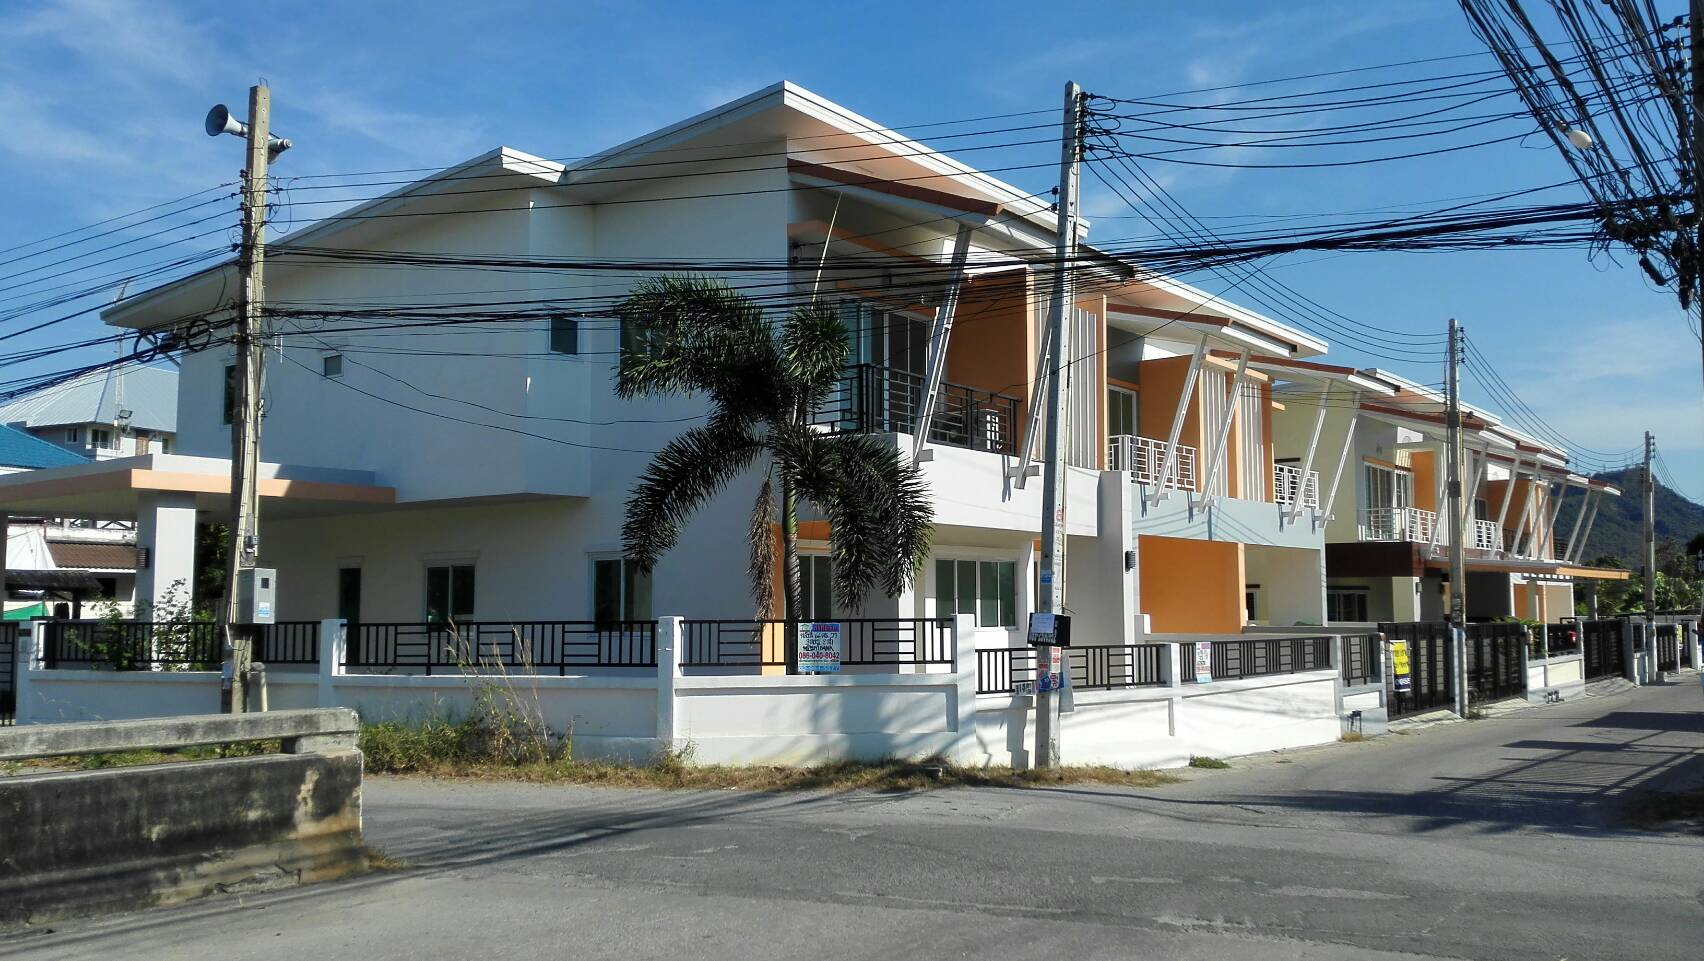 H621 บ้านเดี่ยว 66 ตร.วา ม.เซเว่นเฮ้าส์ หลังมุม บางพระ ชลบุรี อยู่ถนนเทศบาล7 ใกล้อ่างเก็บน้ำบางพระ บ้านใหม่ ไม่เคยอยู่